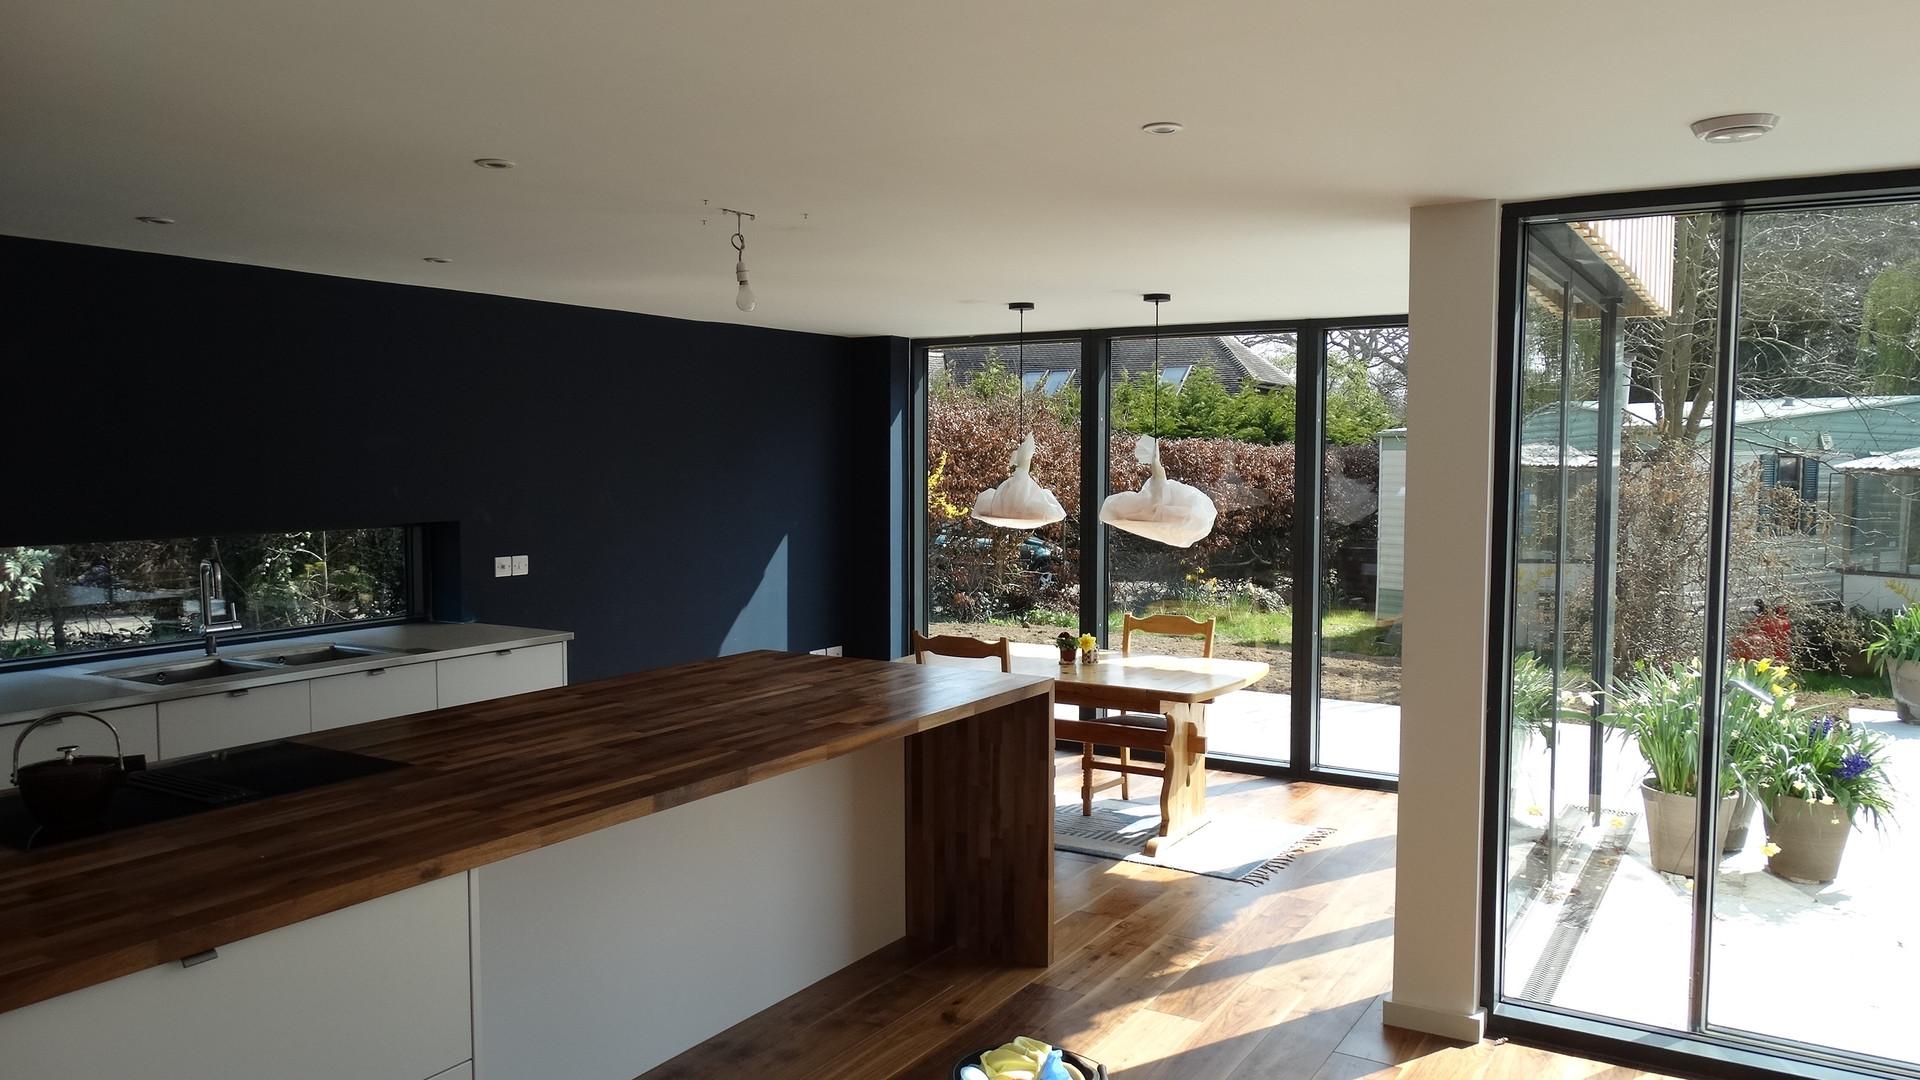 New House Build. Kitchen Diner - Addington